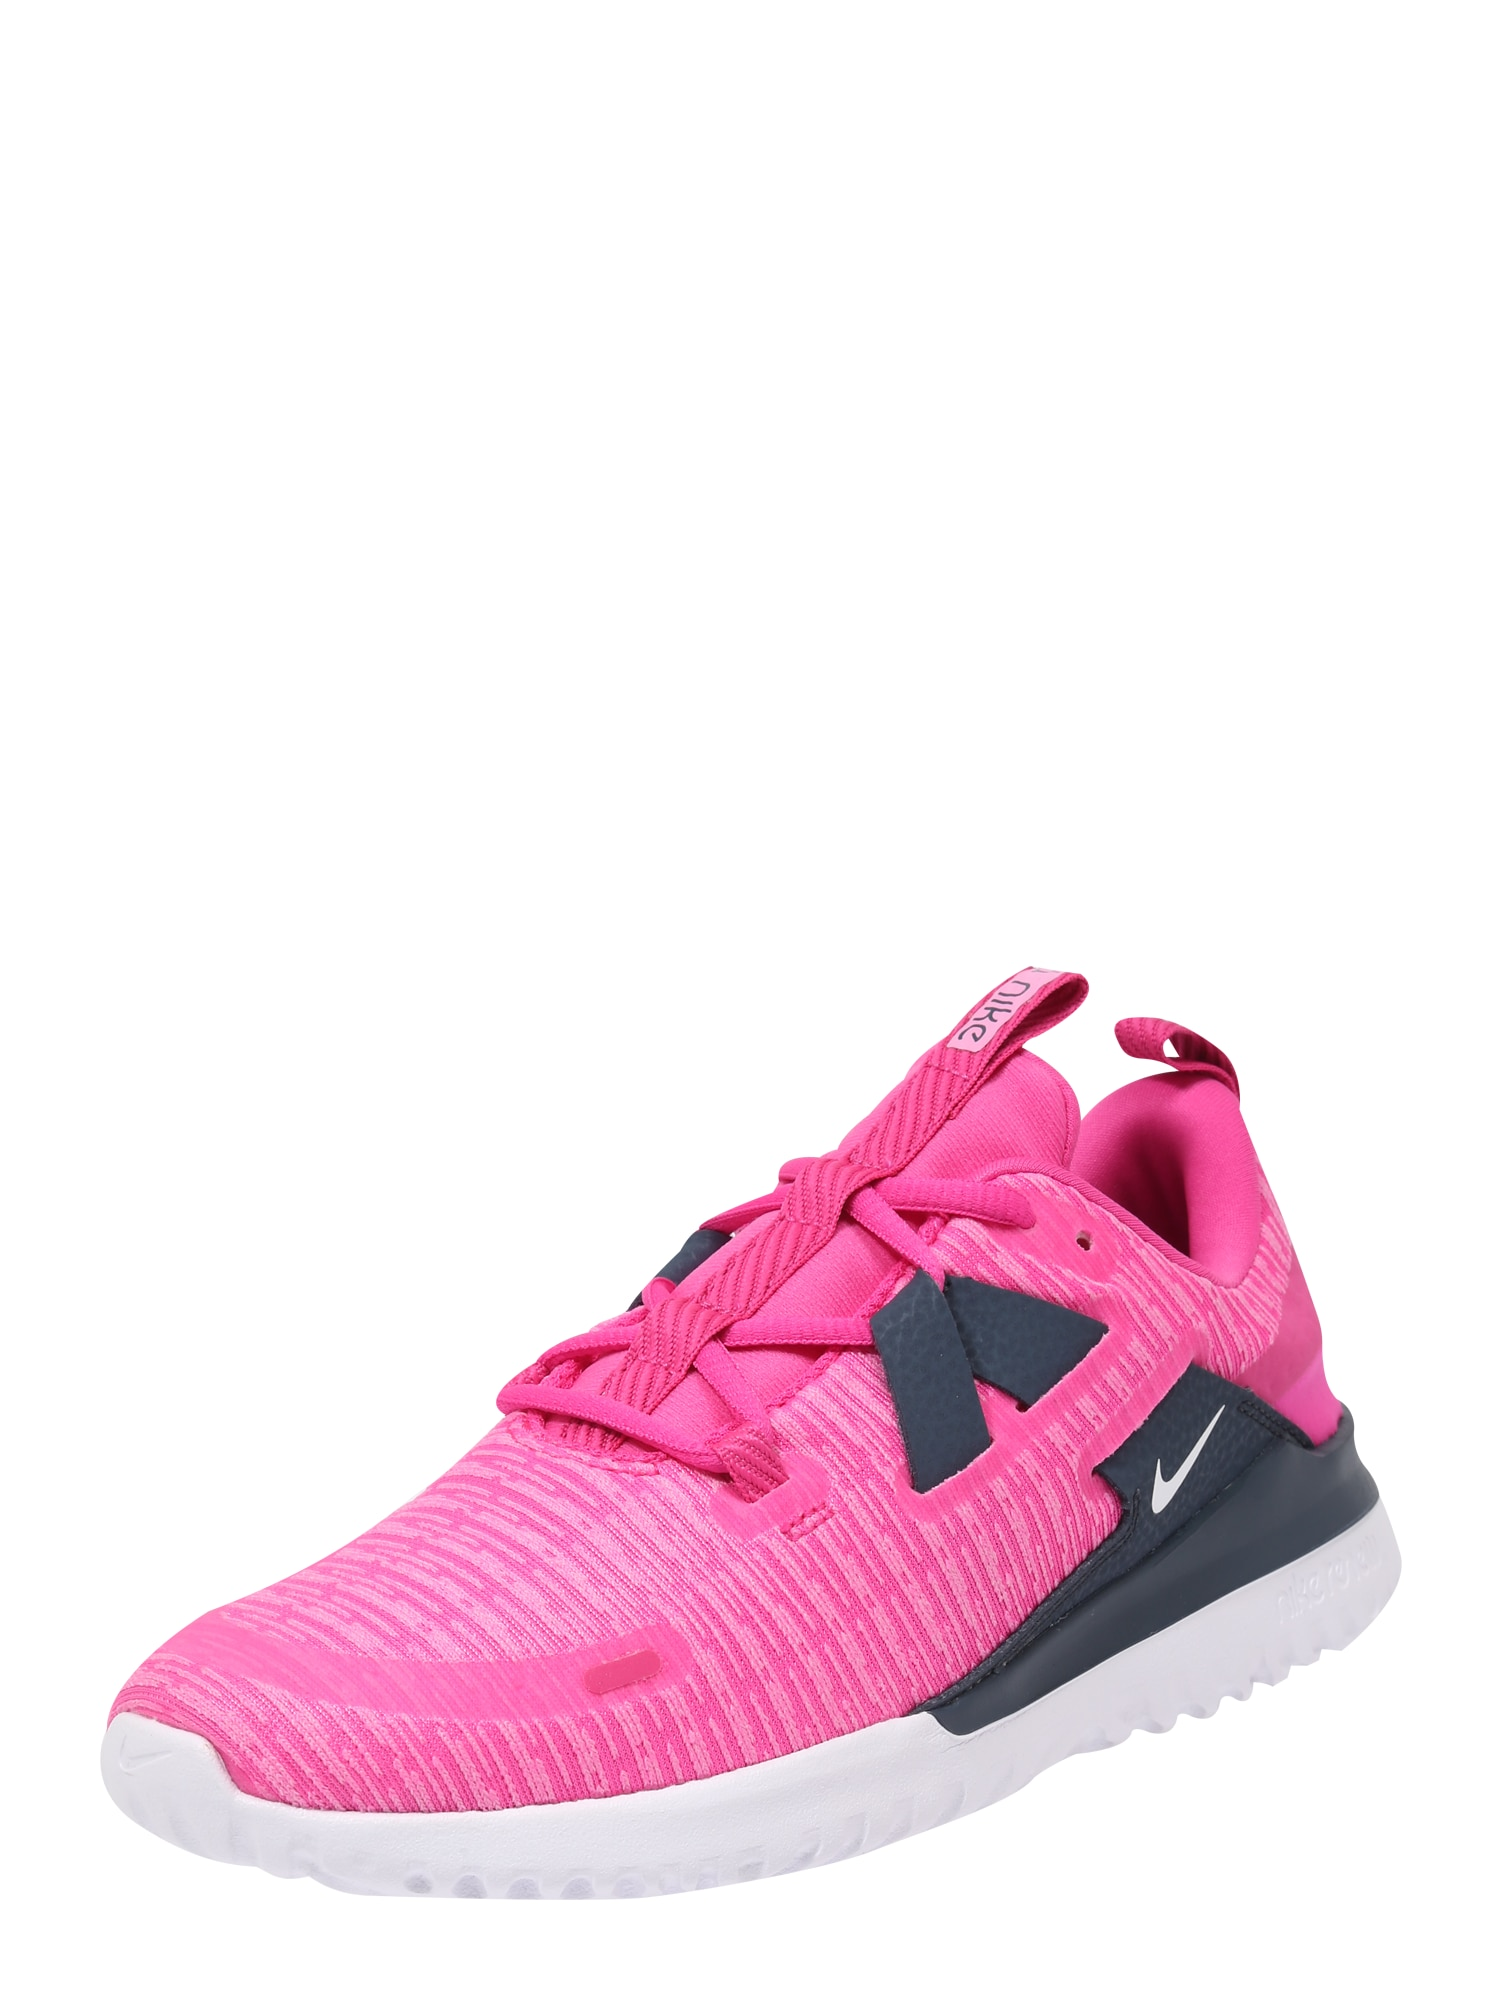 Běžecká obuv Nike Renew Arena tmavě šedá pink NIKE